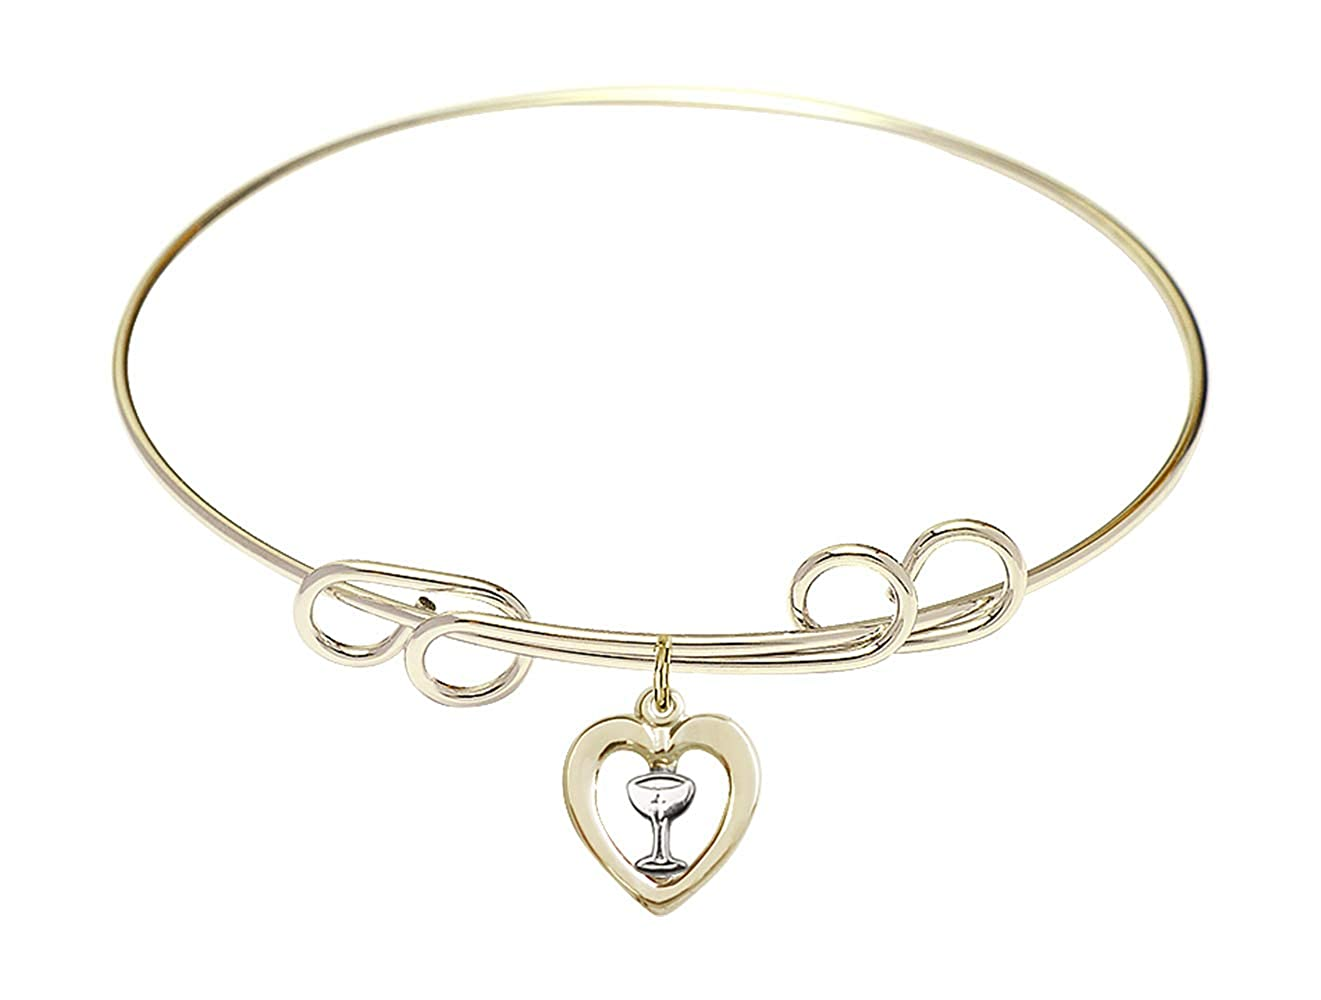 DiamondJewelryNY Double Loop Bangle Bracelet with a Heart//Chalice Charm.